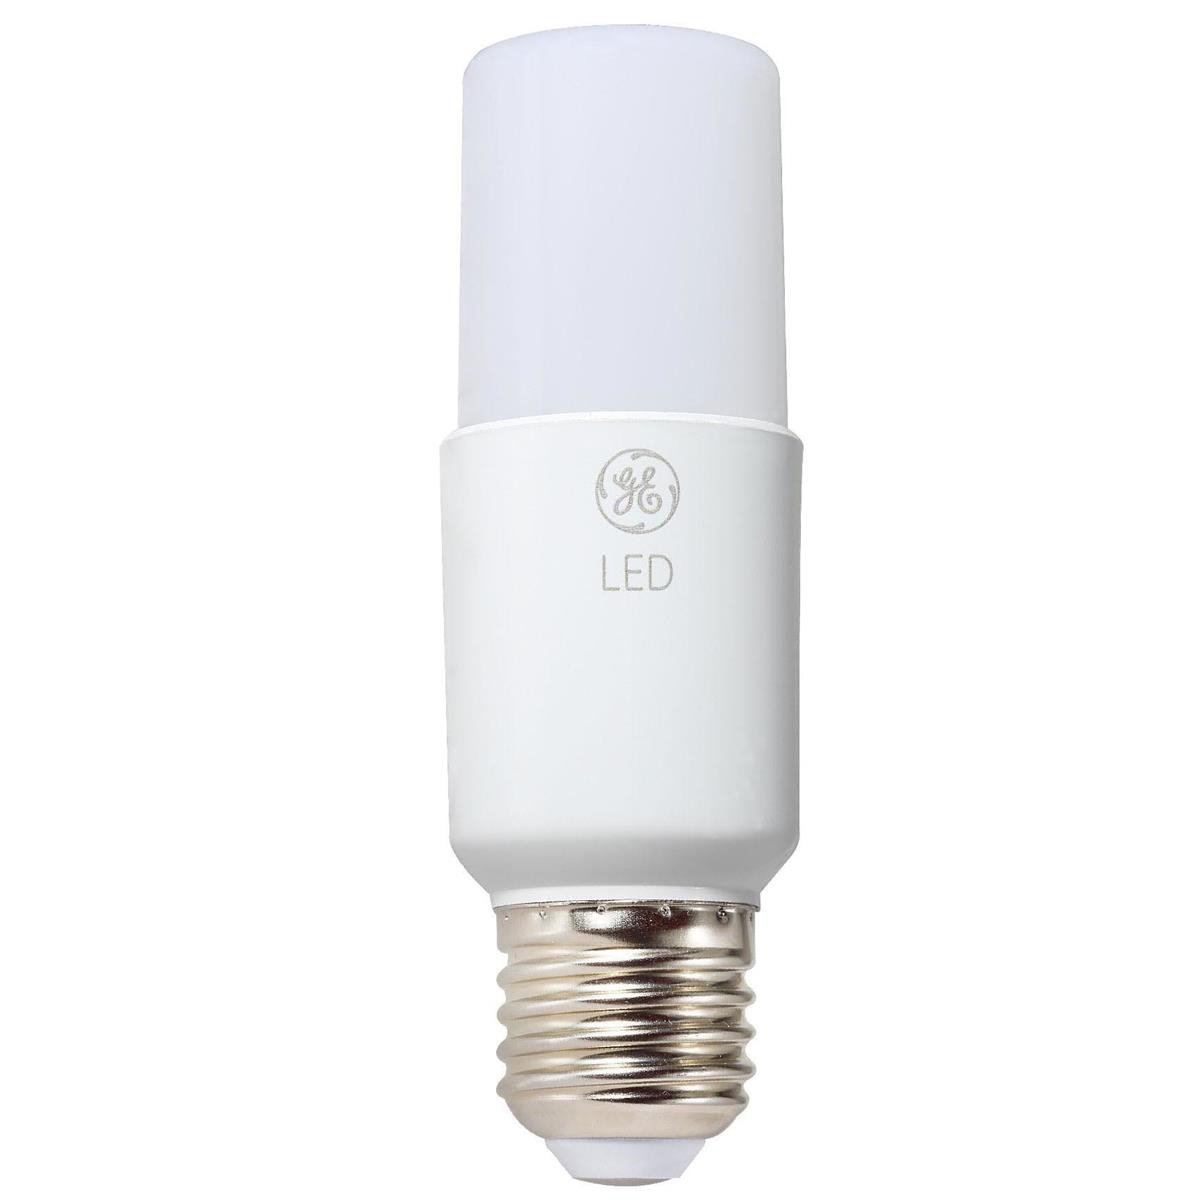 Tungsram Bulb LED E27 Bright Stik 15Watt 1521Lumens EEC A+ CCT 6500K Daylight Ref 93064031